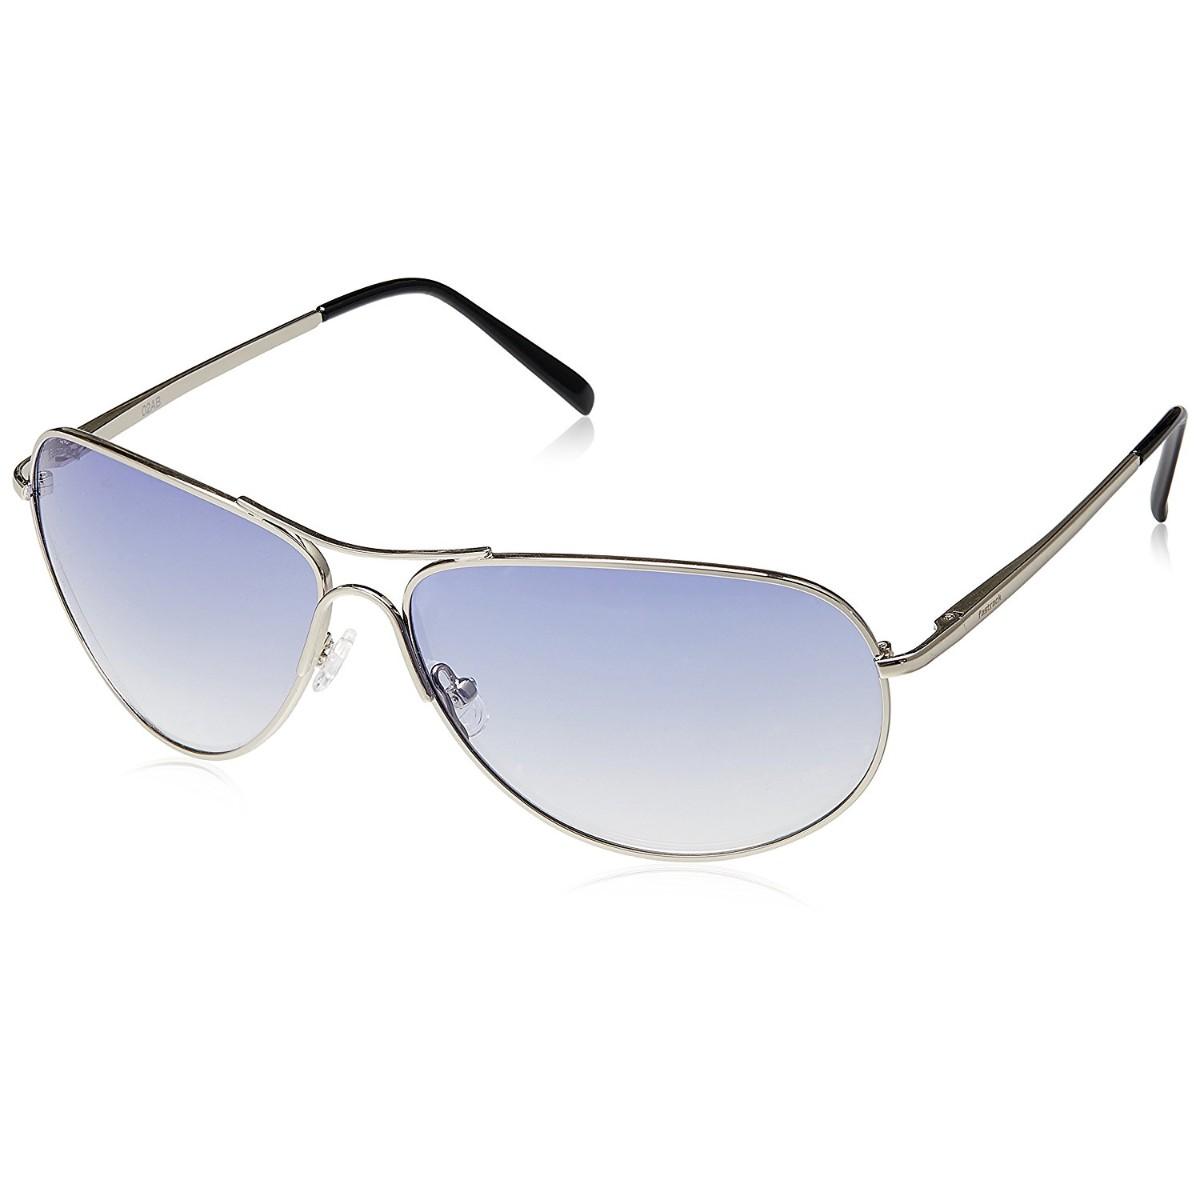 Aviator Men's Sunglasses